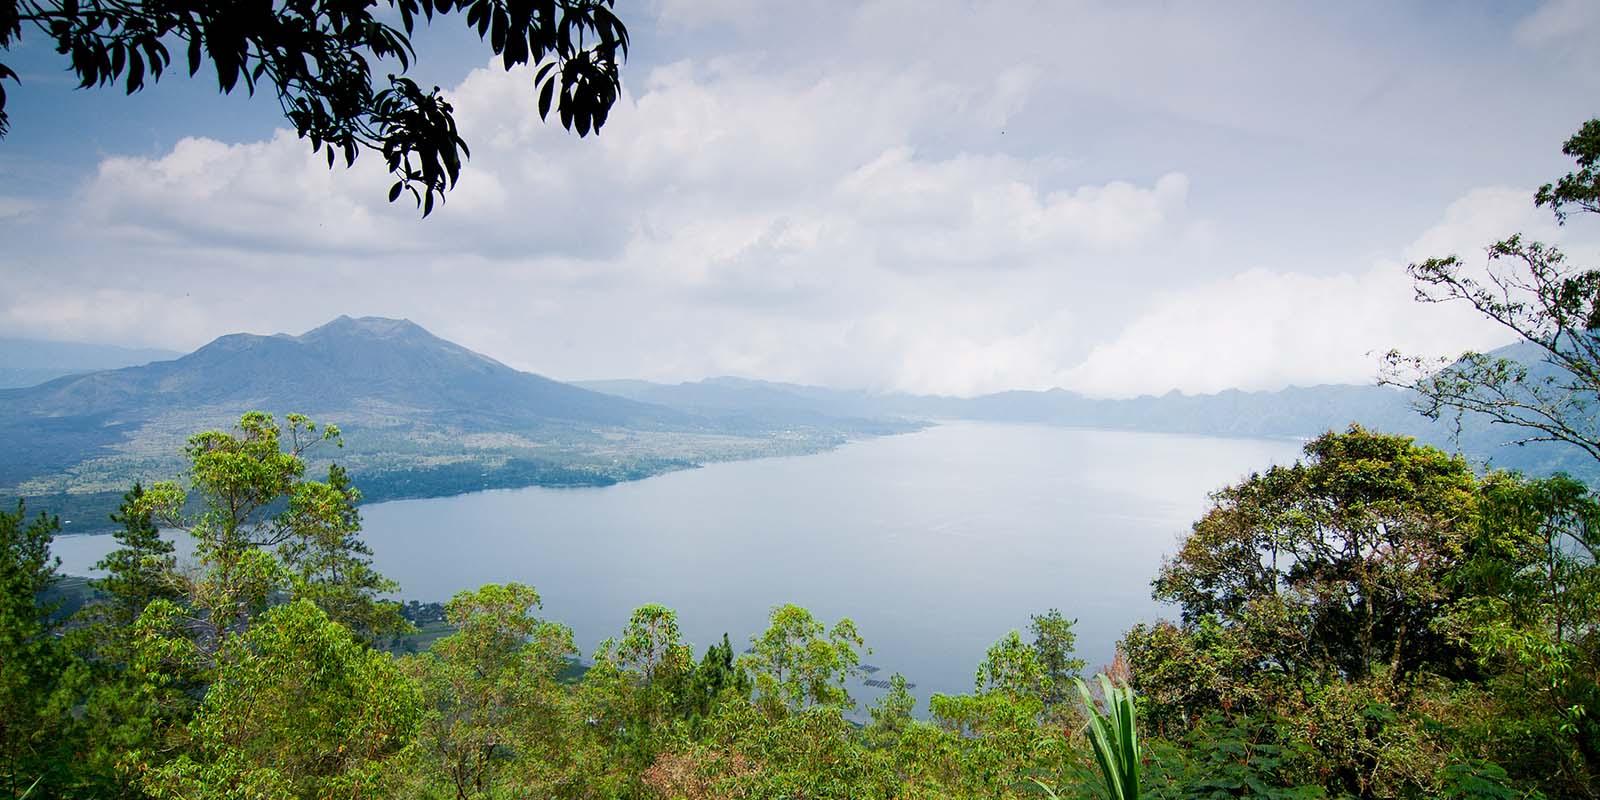 Gunung Batur lake and volcano